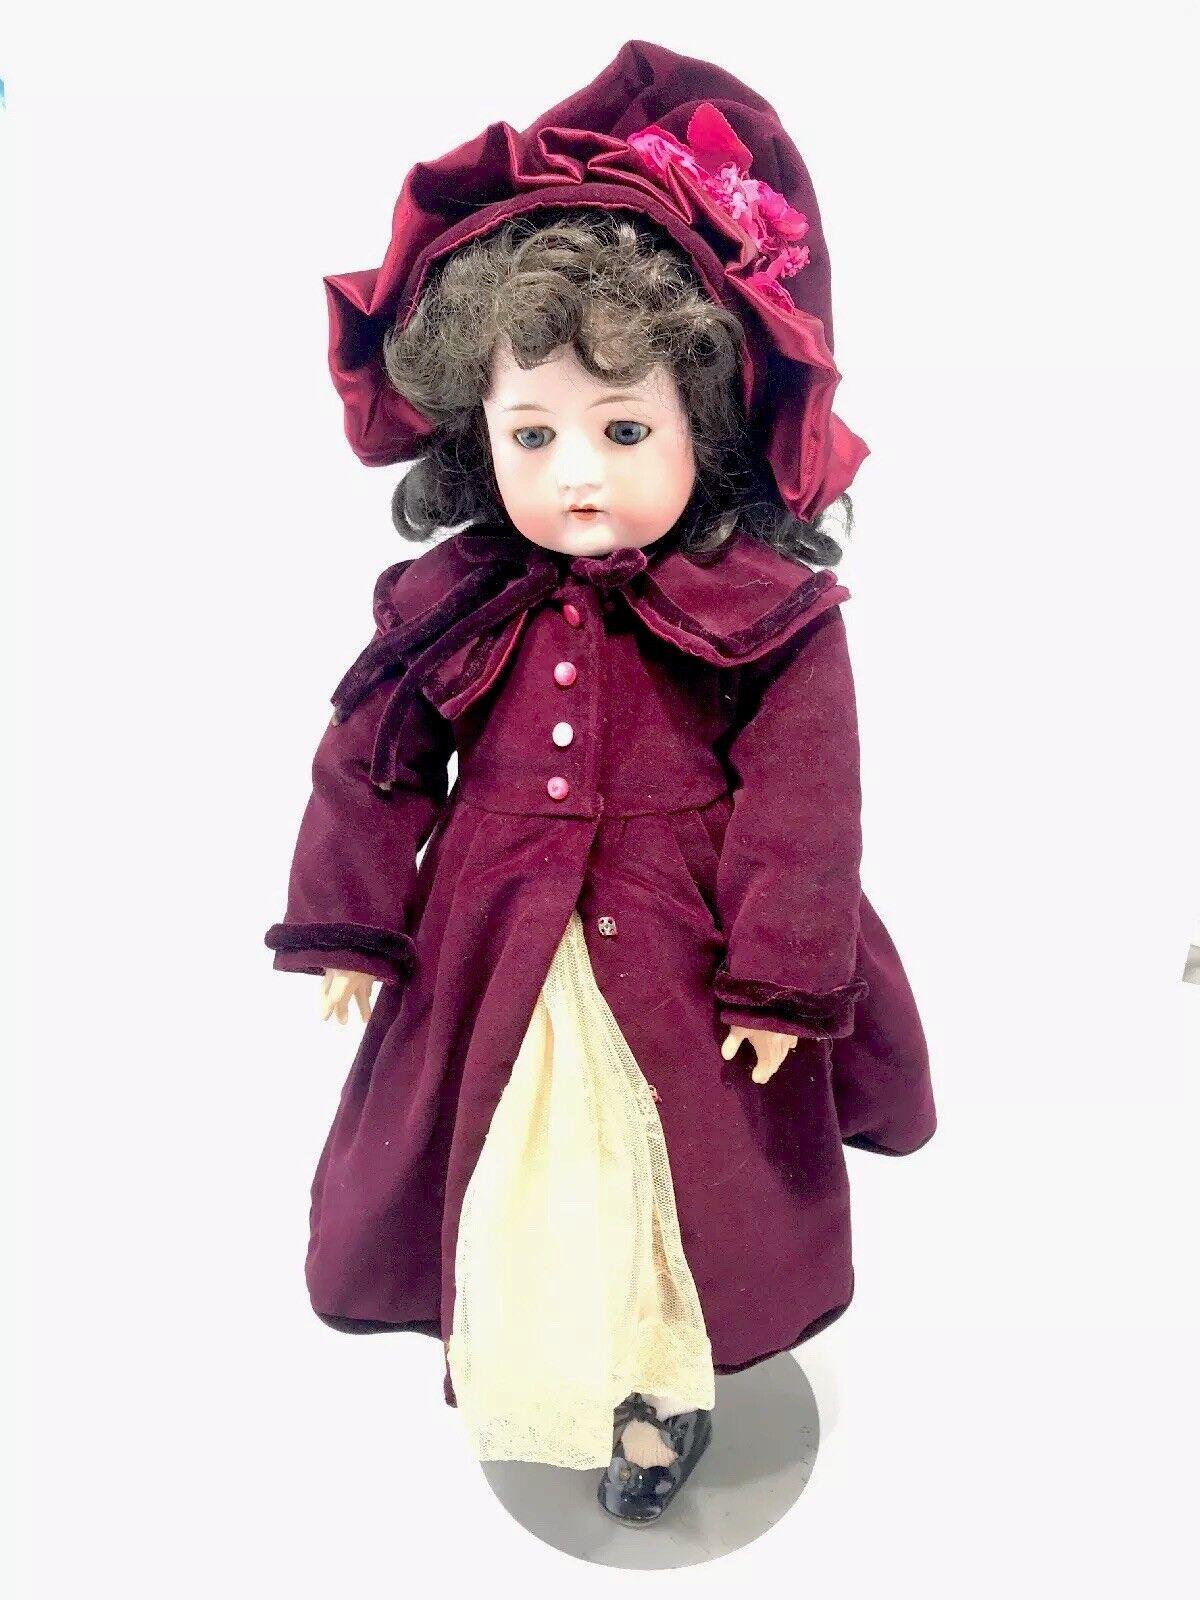 24  Antique Cuno Otto Dressel Geruomo Bisque  bambola 1912-5 Sleep Eyes 4 Point estrella  confortevole